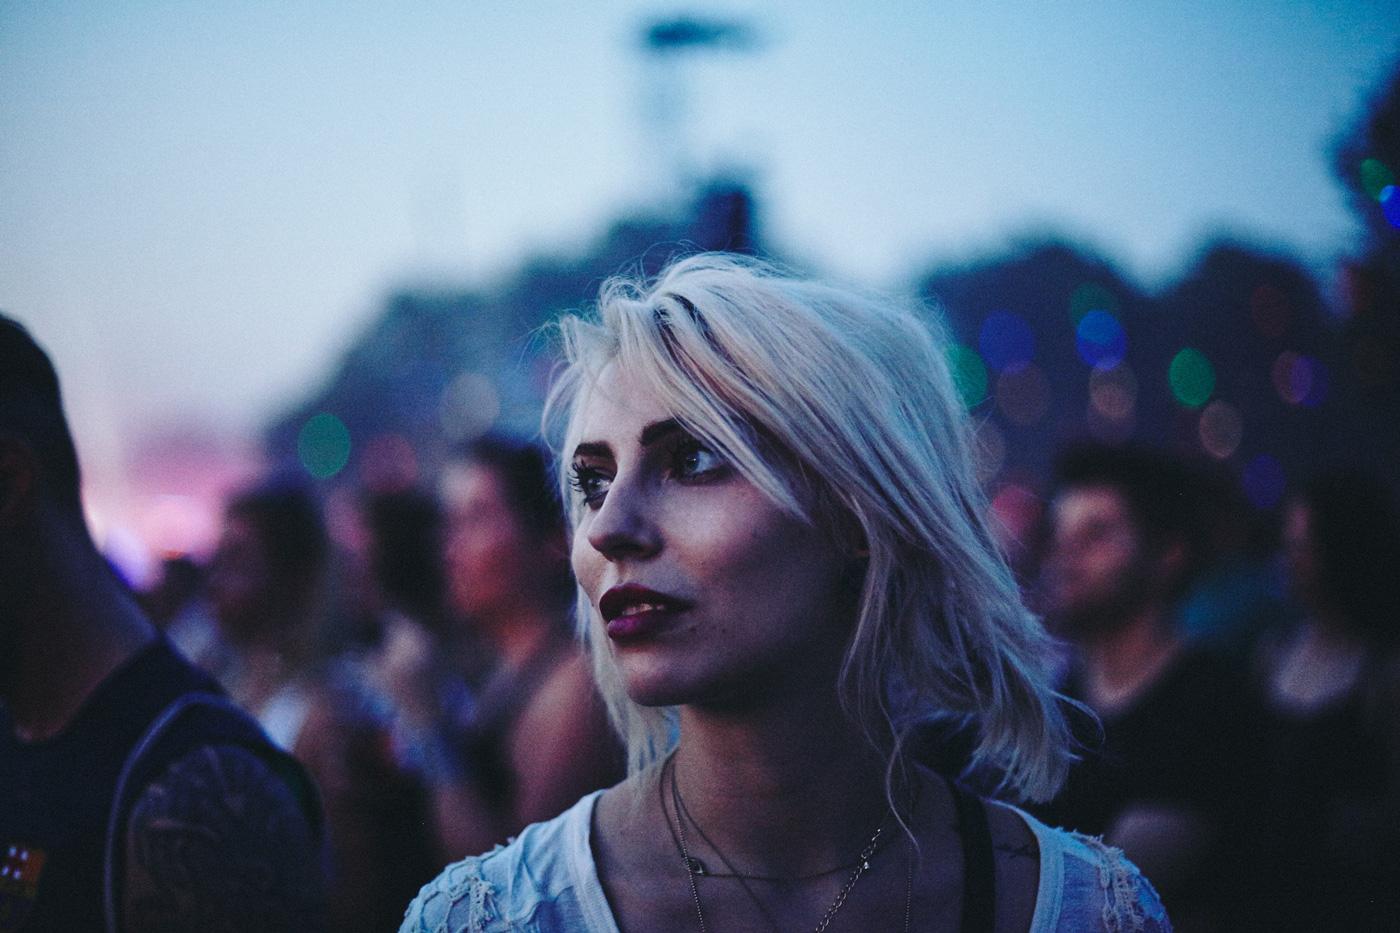 Sziget-Festival-Impressions-2015-Sziget-Festival-Impressions-2015-16